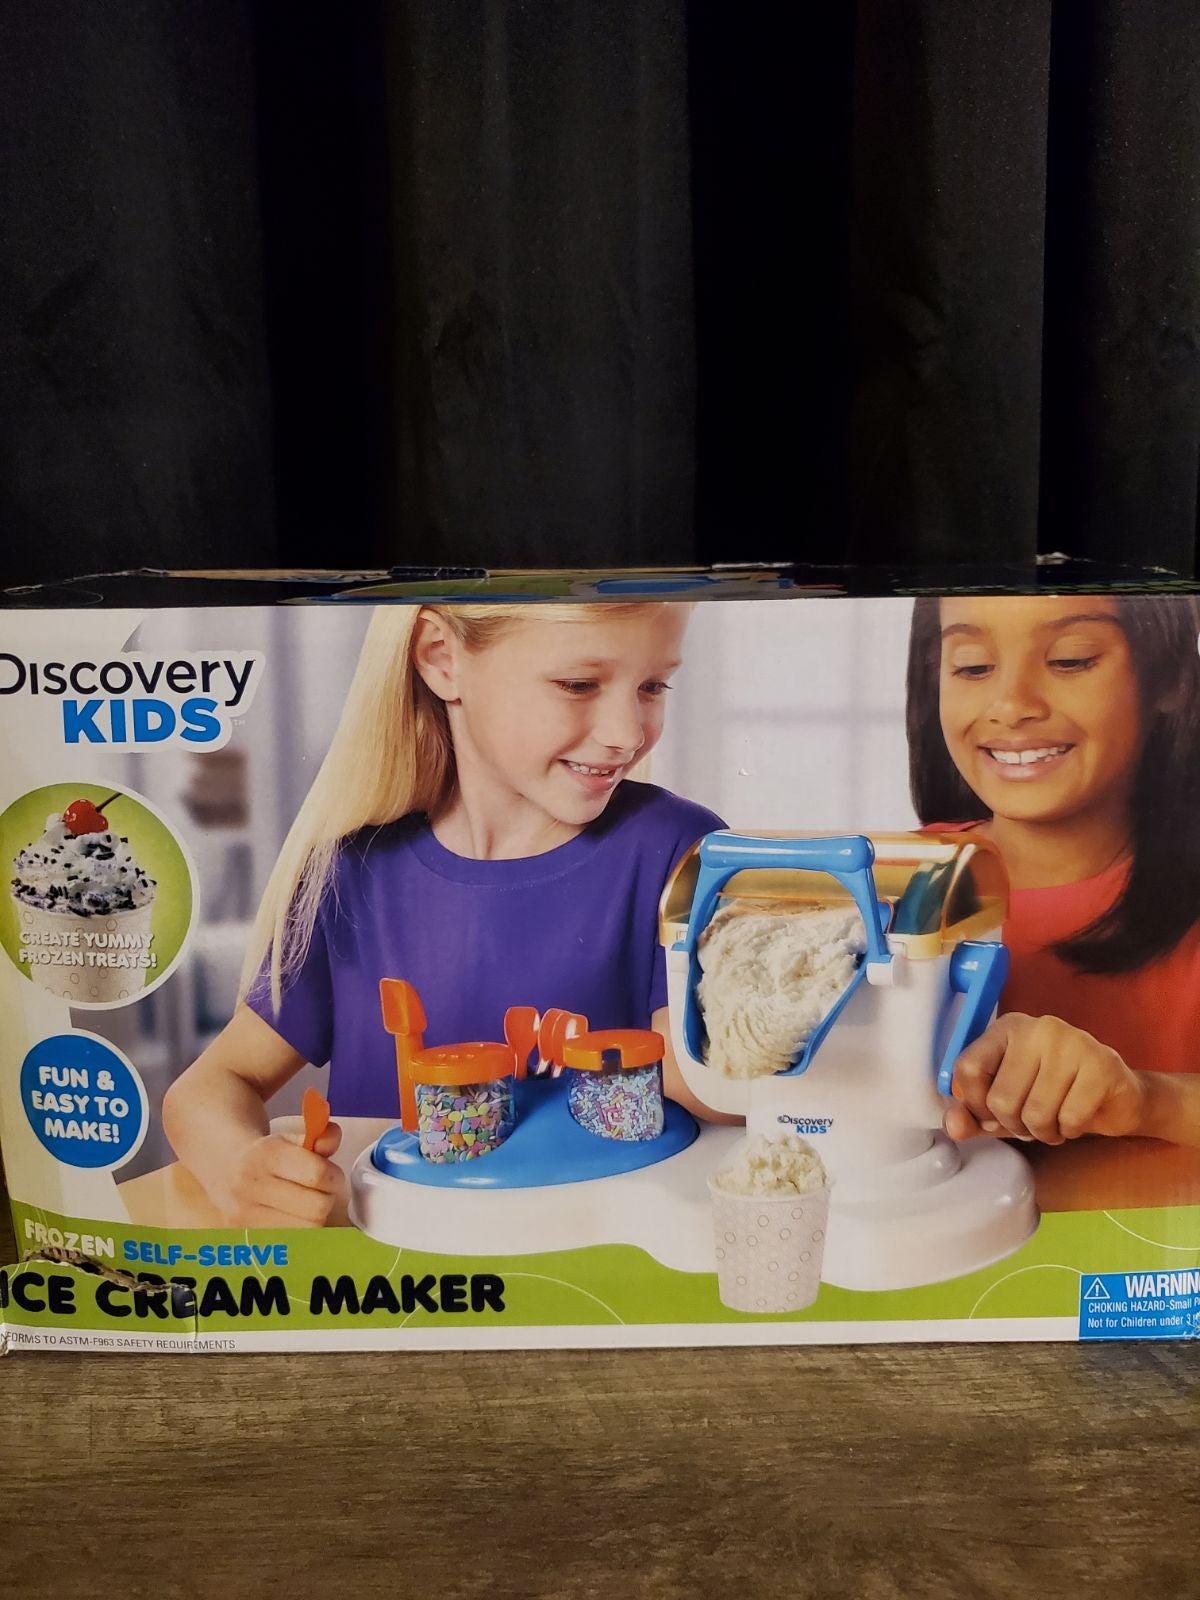 Discovery kids Ice Cream Maker